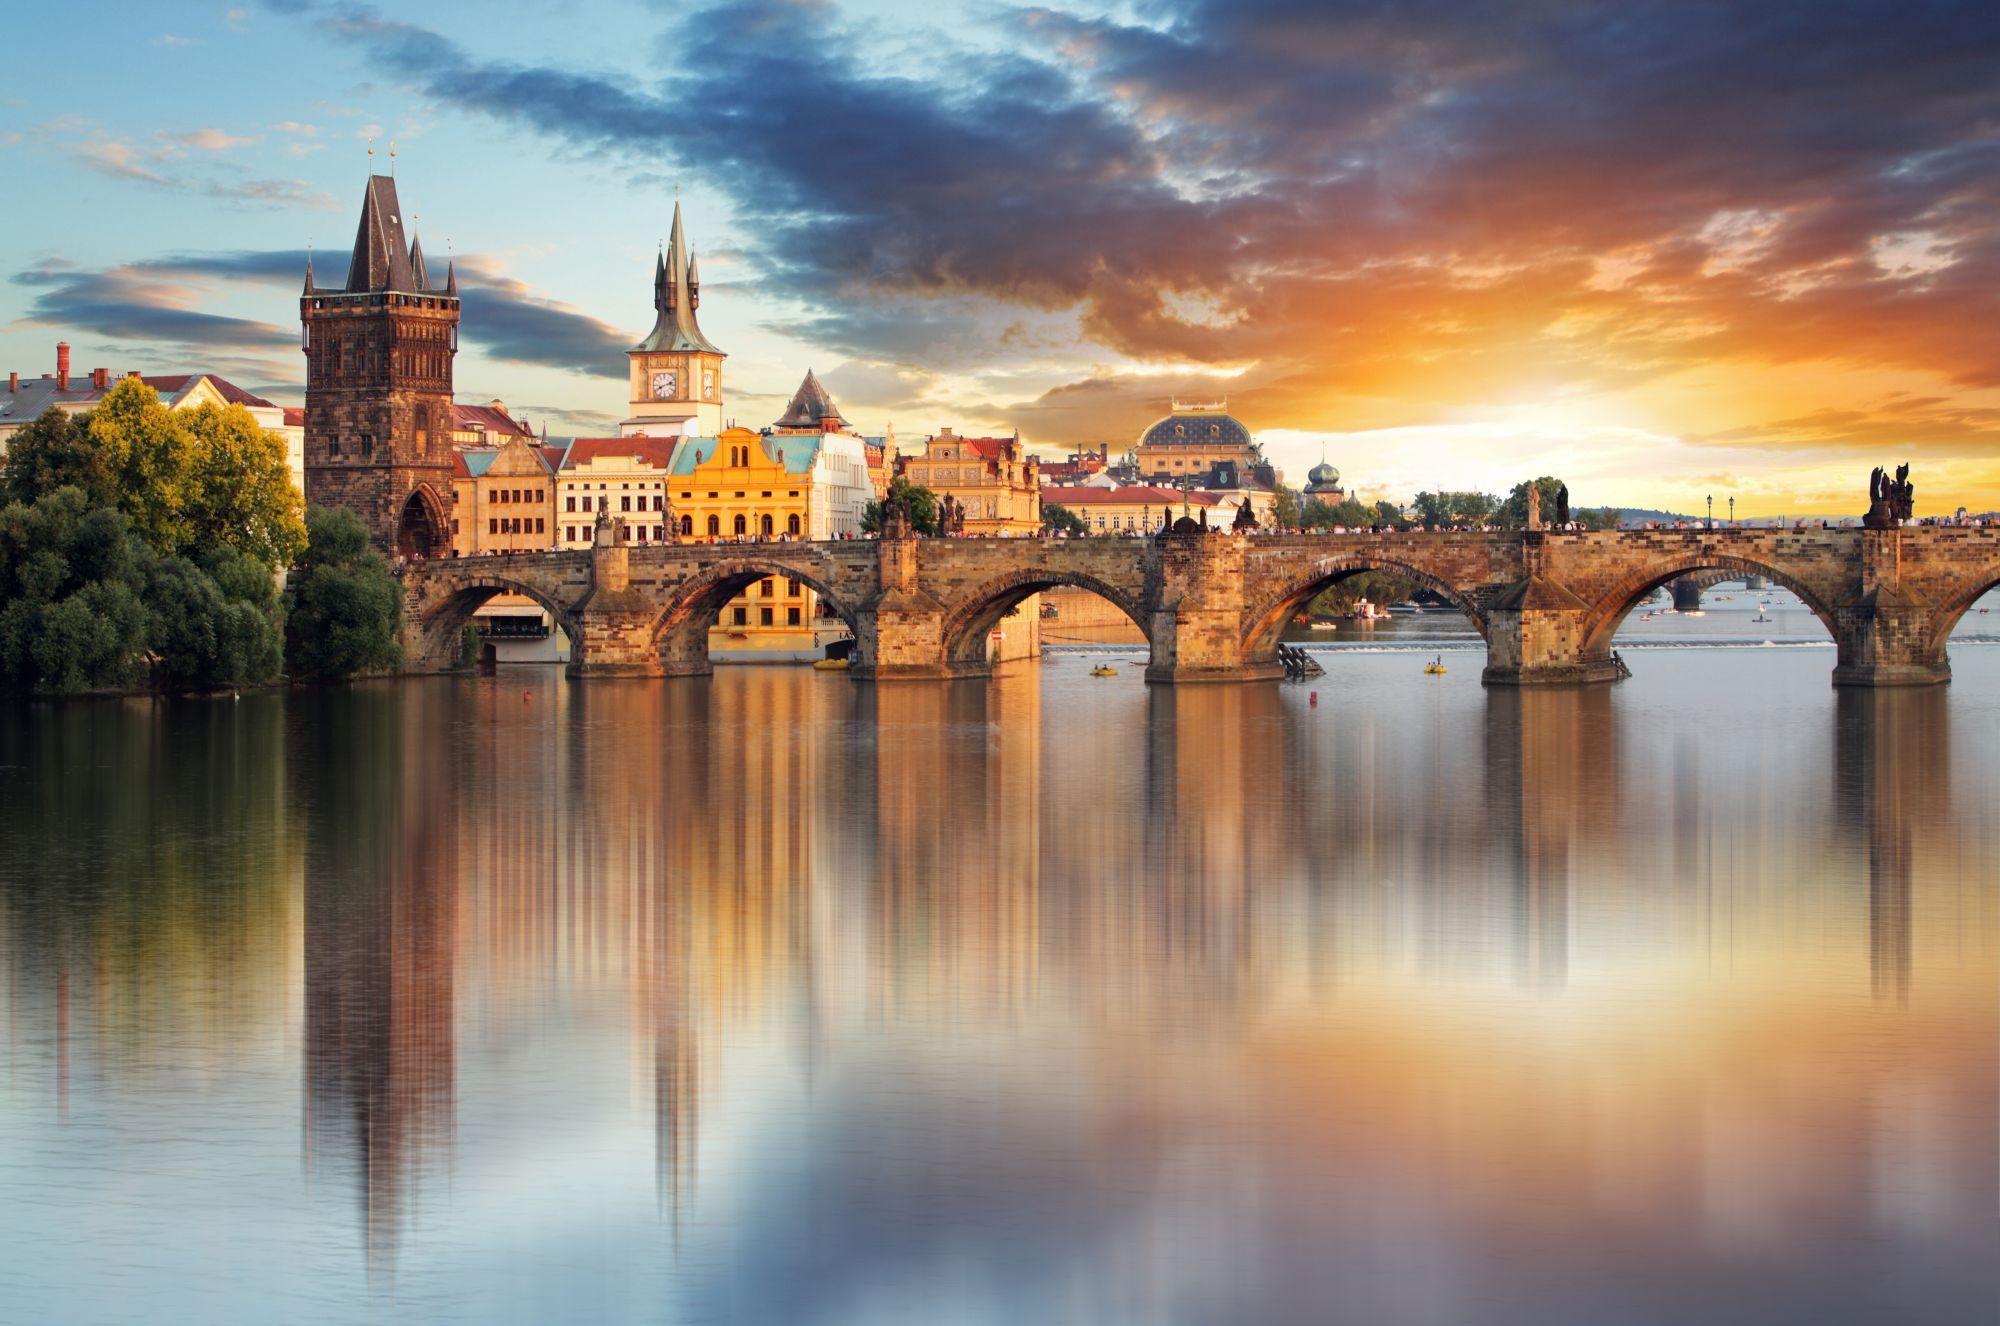 Praga widok rzeki i mostu